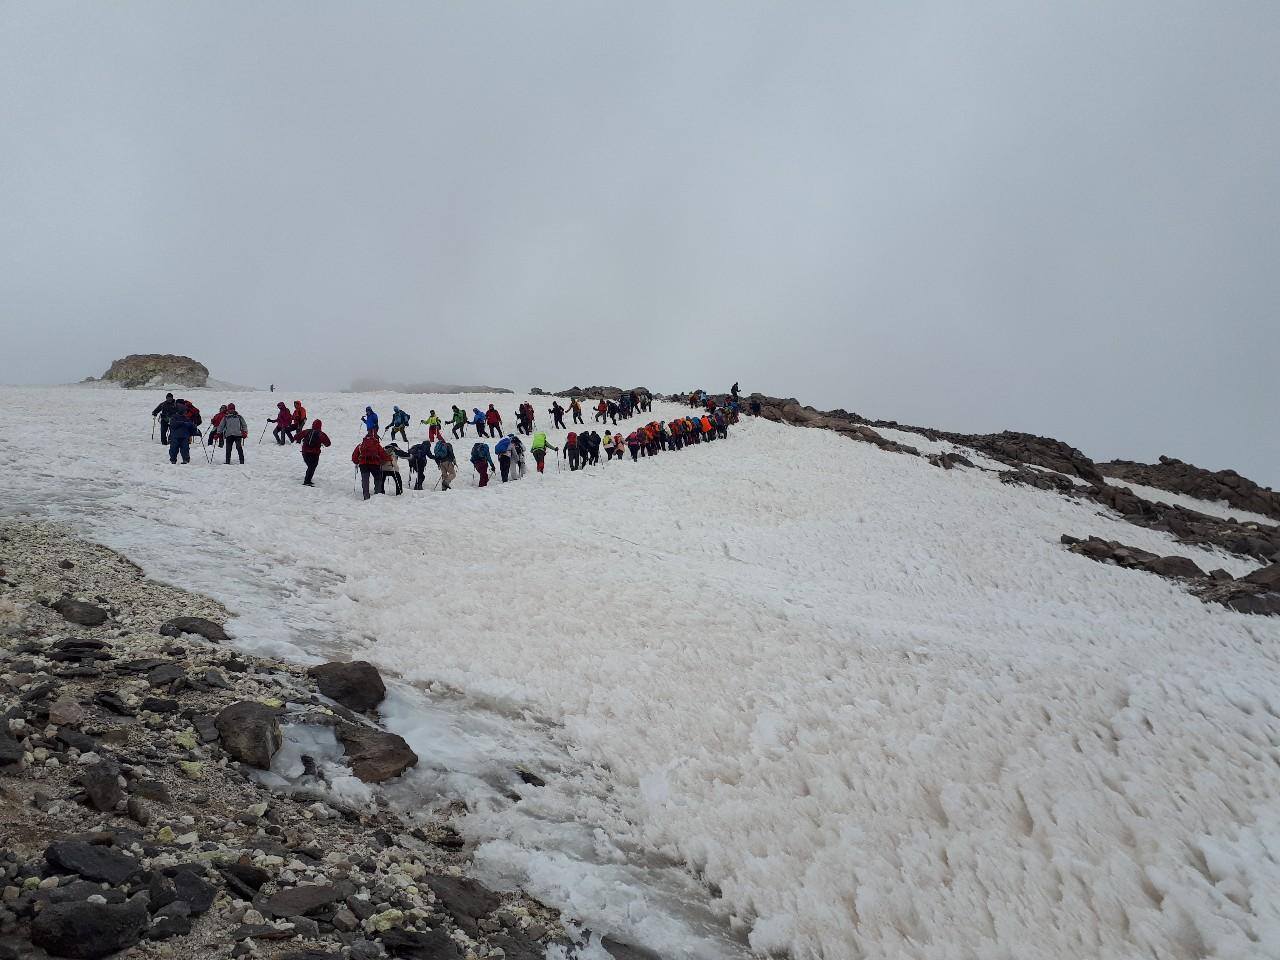 Lots of climbers, Mount Damavand